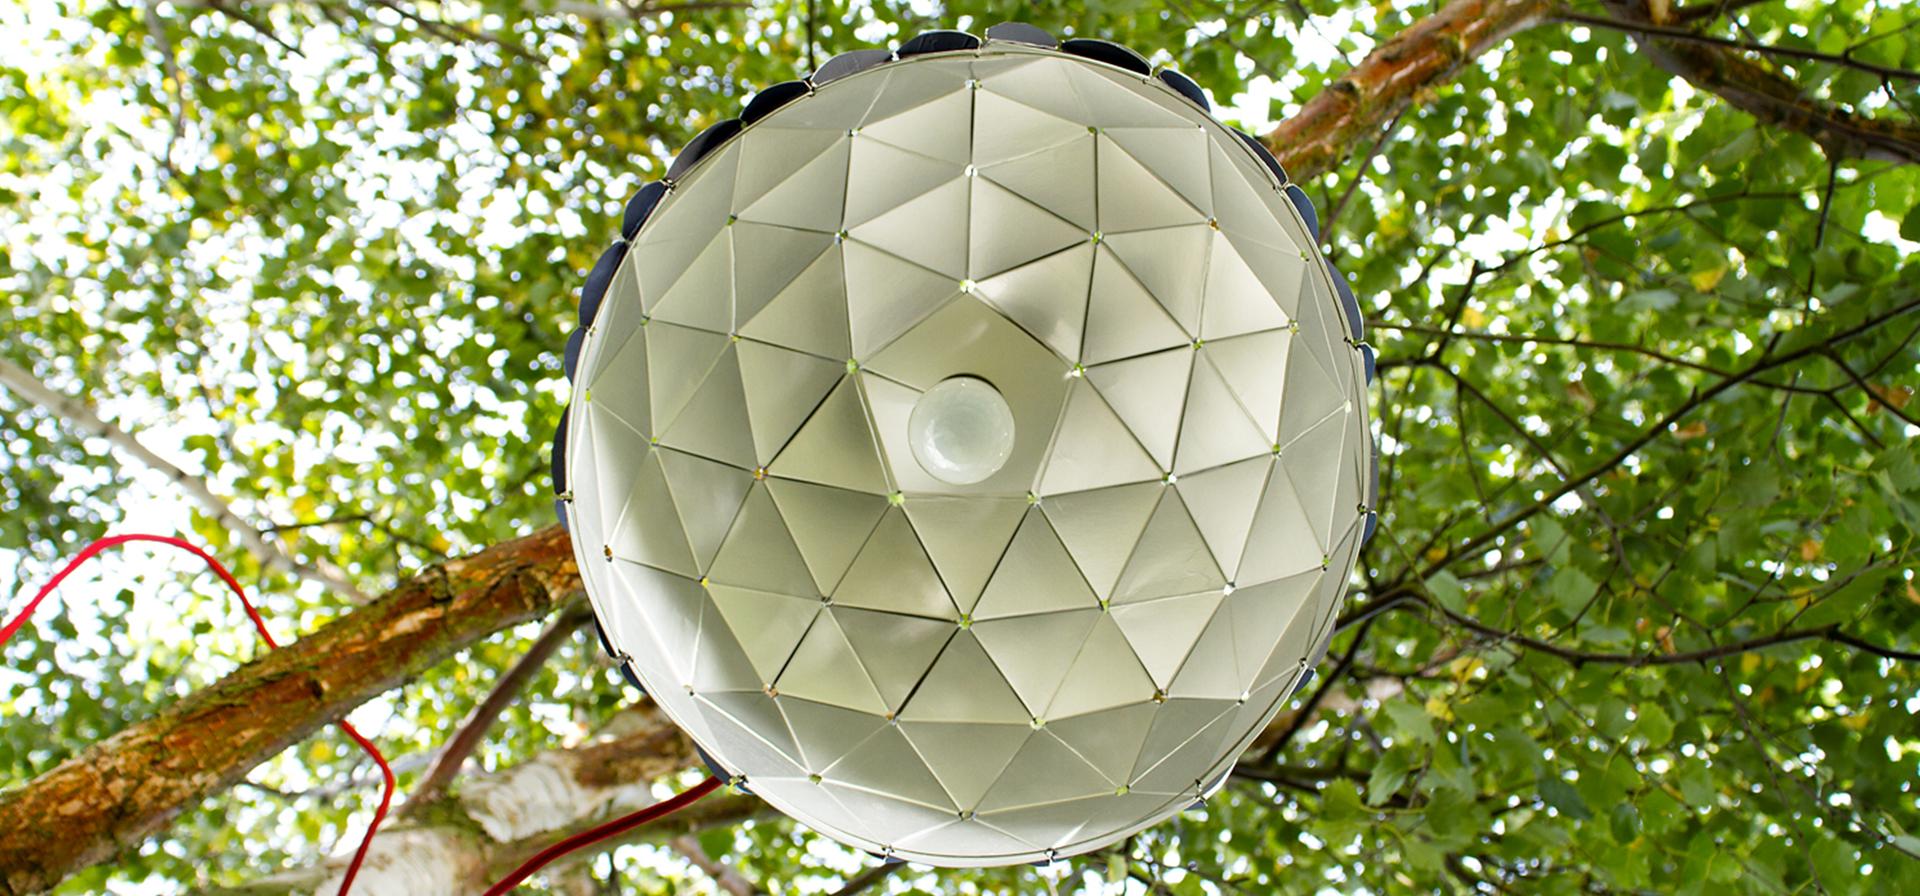 unistudio merci design de la lampe de demain avec les mat riaux d 39 hier. Black Bedroom Furniture Sets. Home Design Ideas